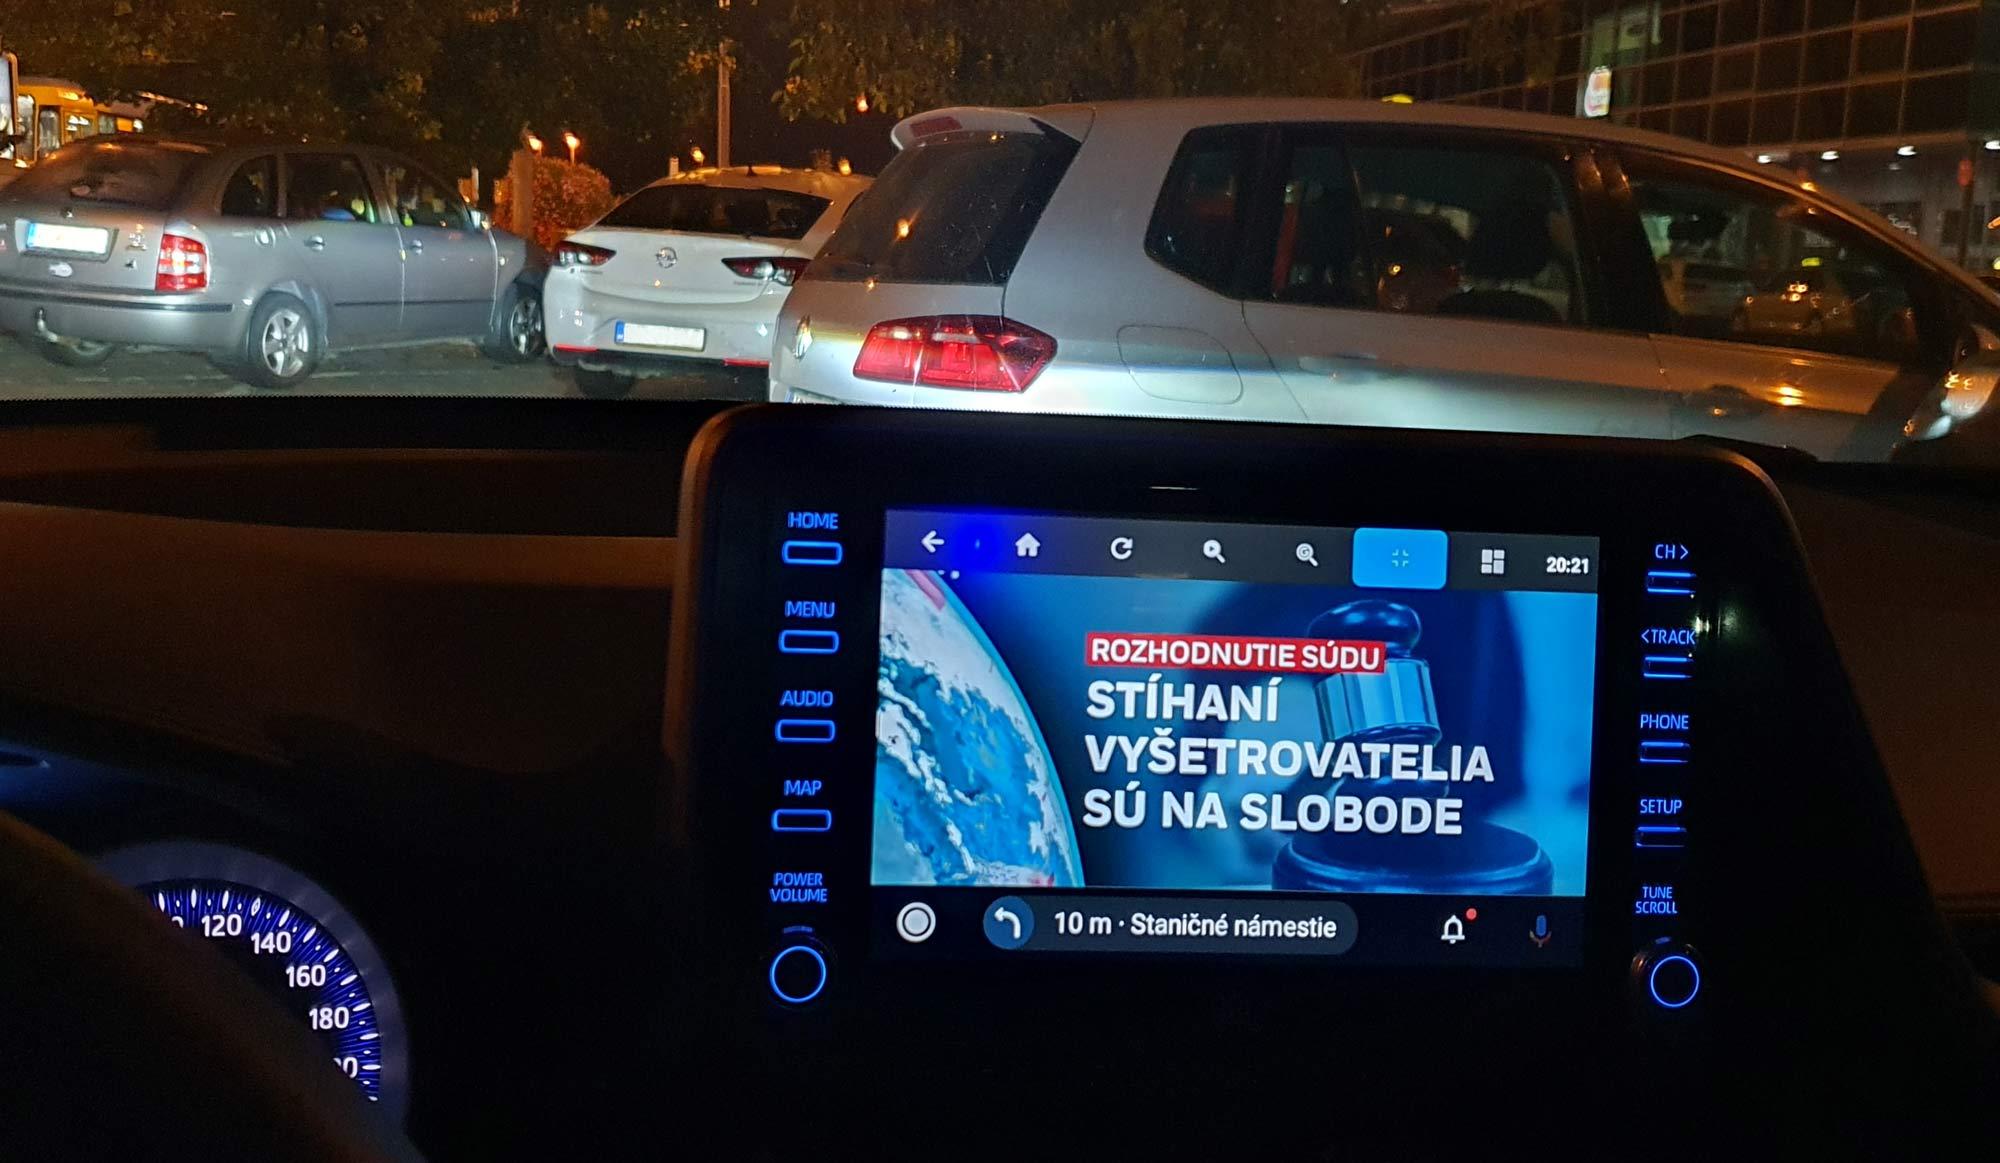 Sledovanie TV cez Android Auto